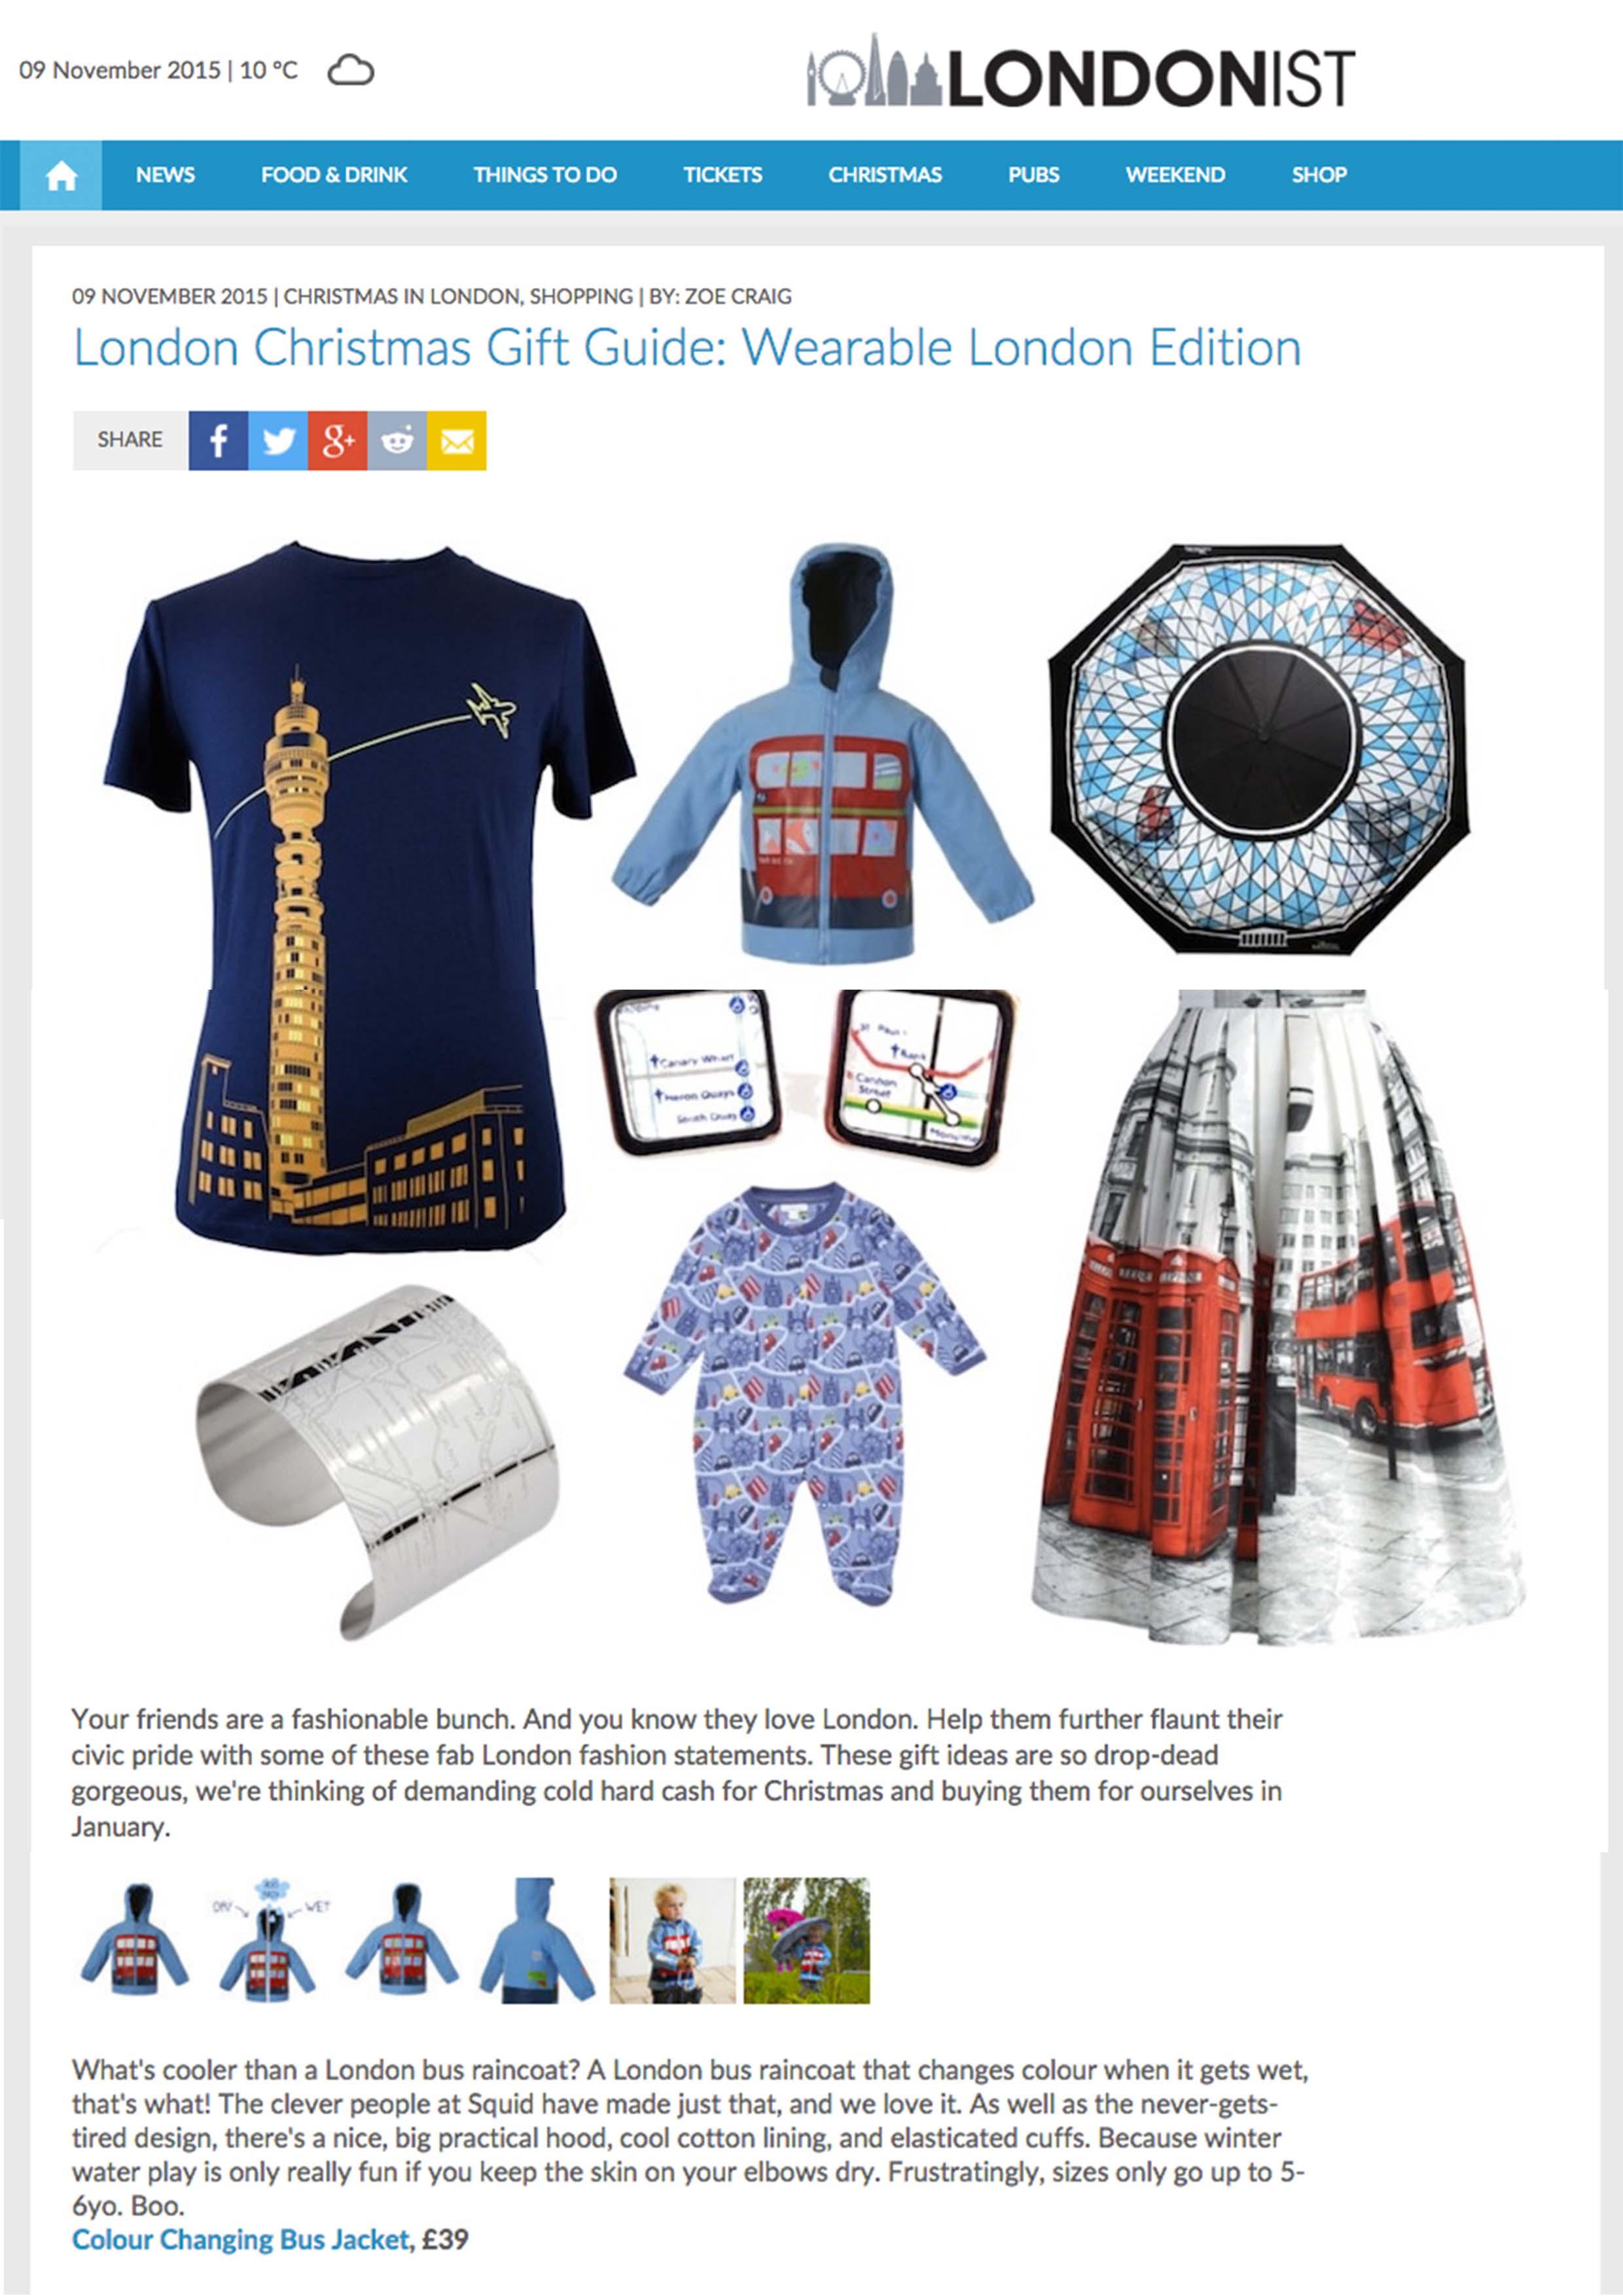 November 2015 Londonist